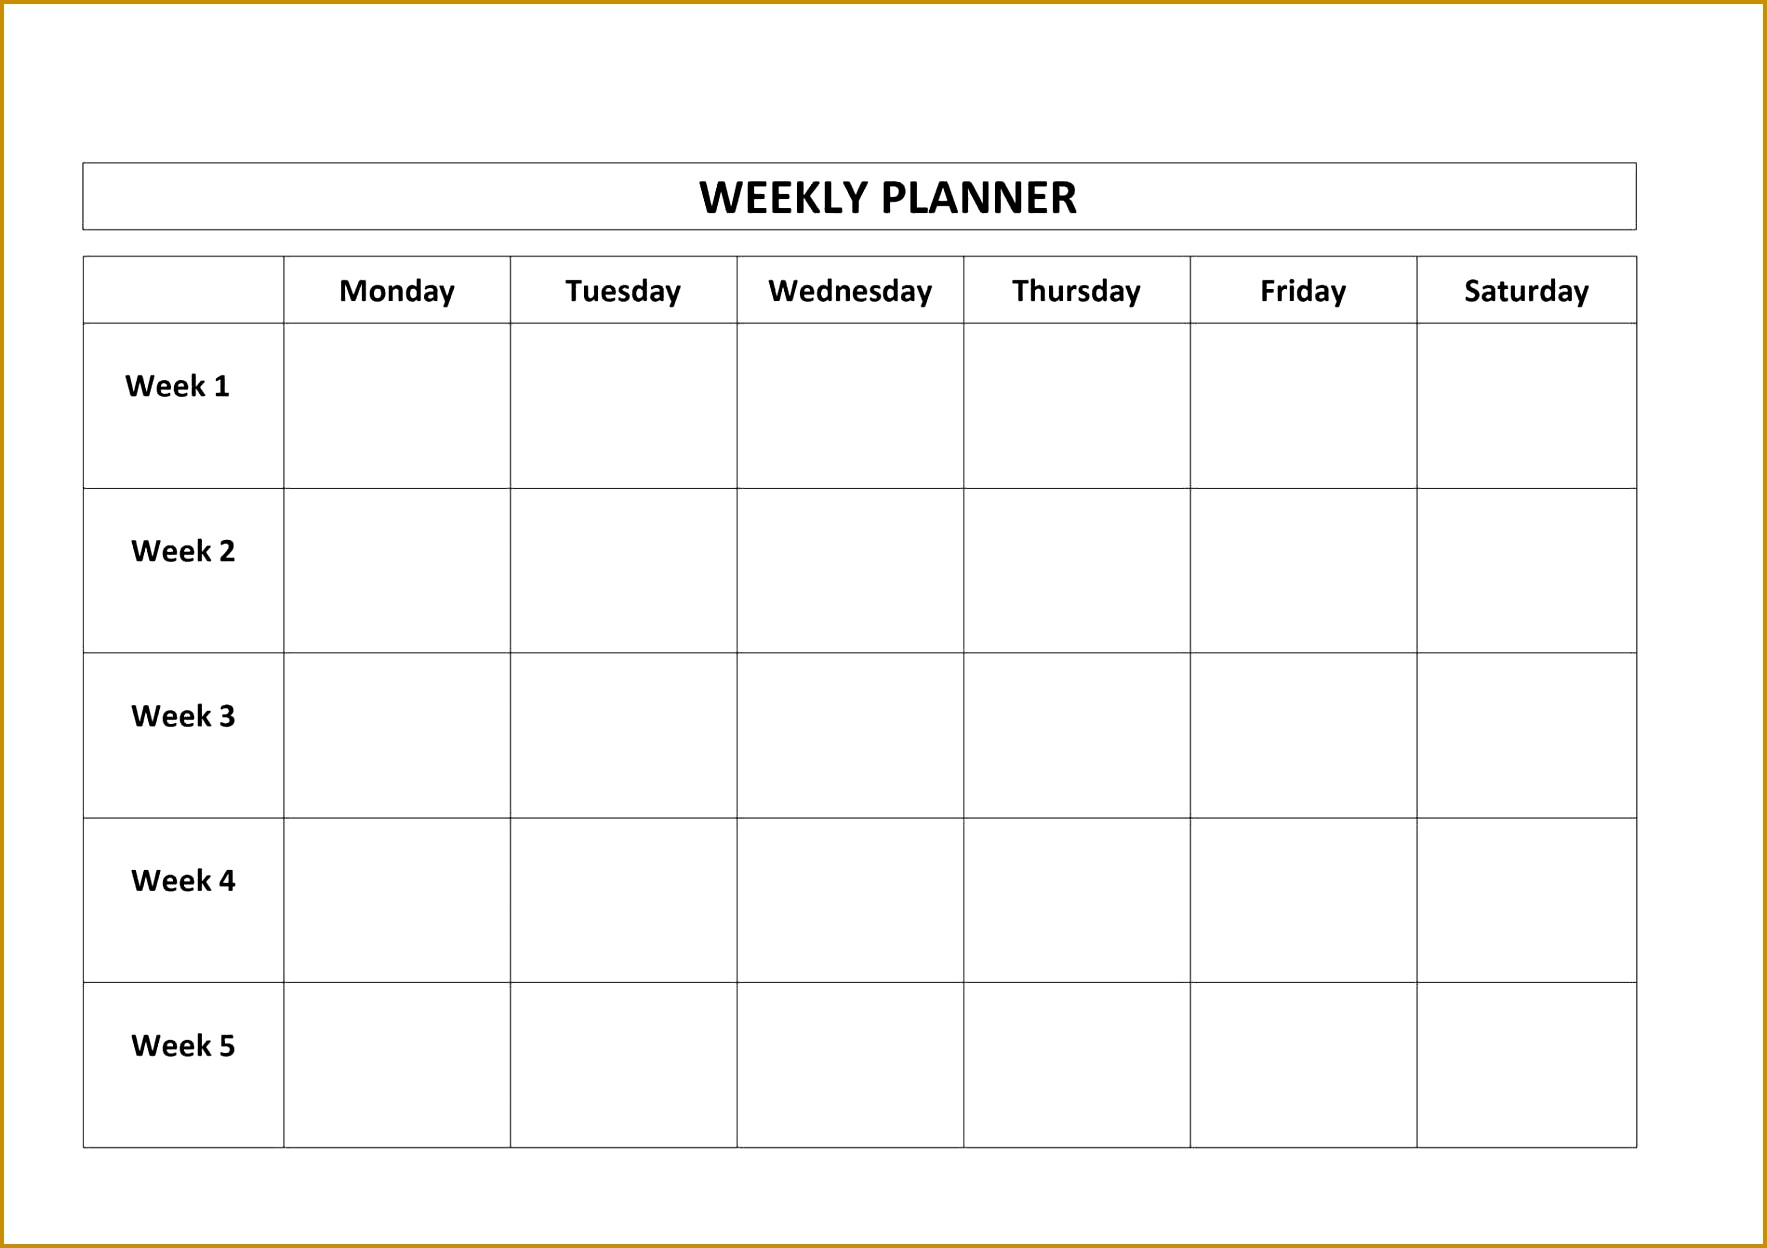 4 Salary Sheet Template In Excel Fabtemplatez